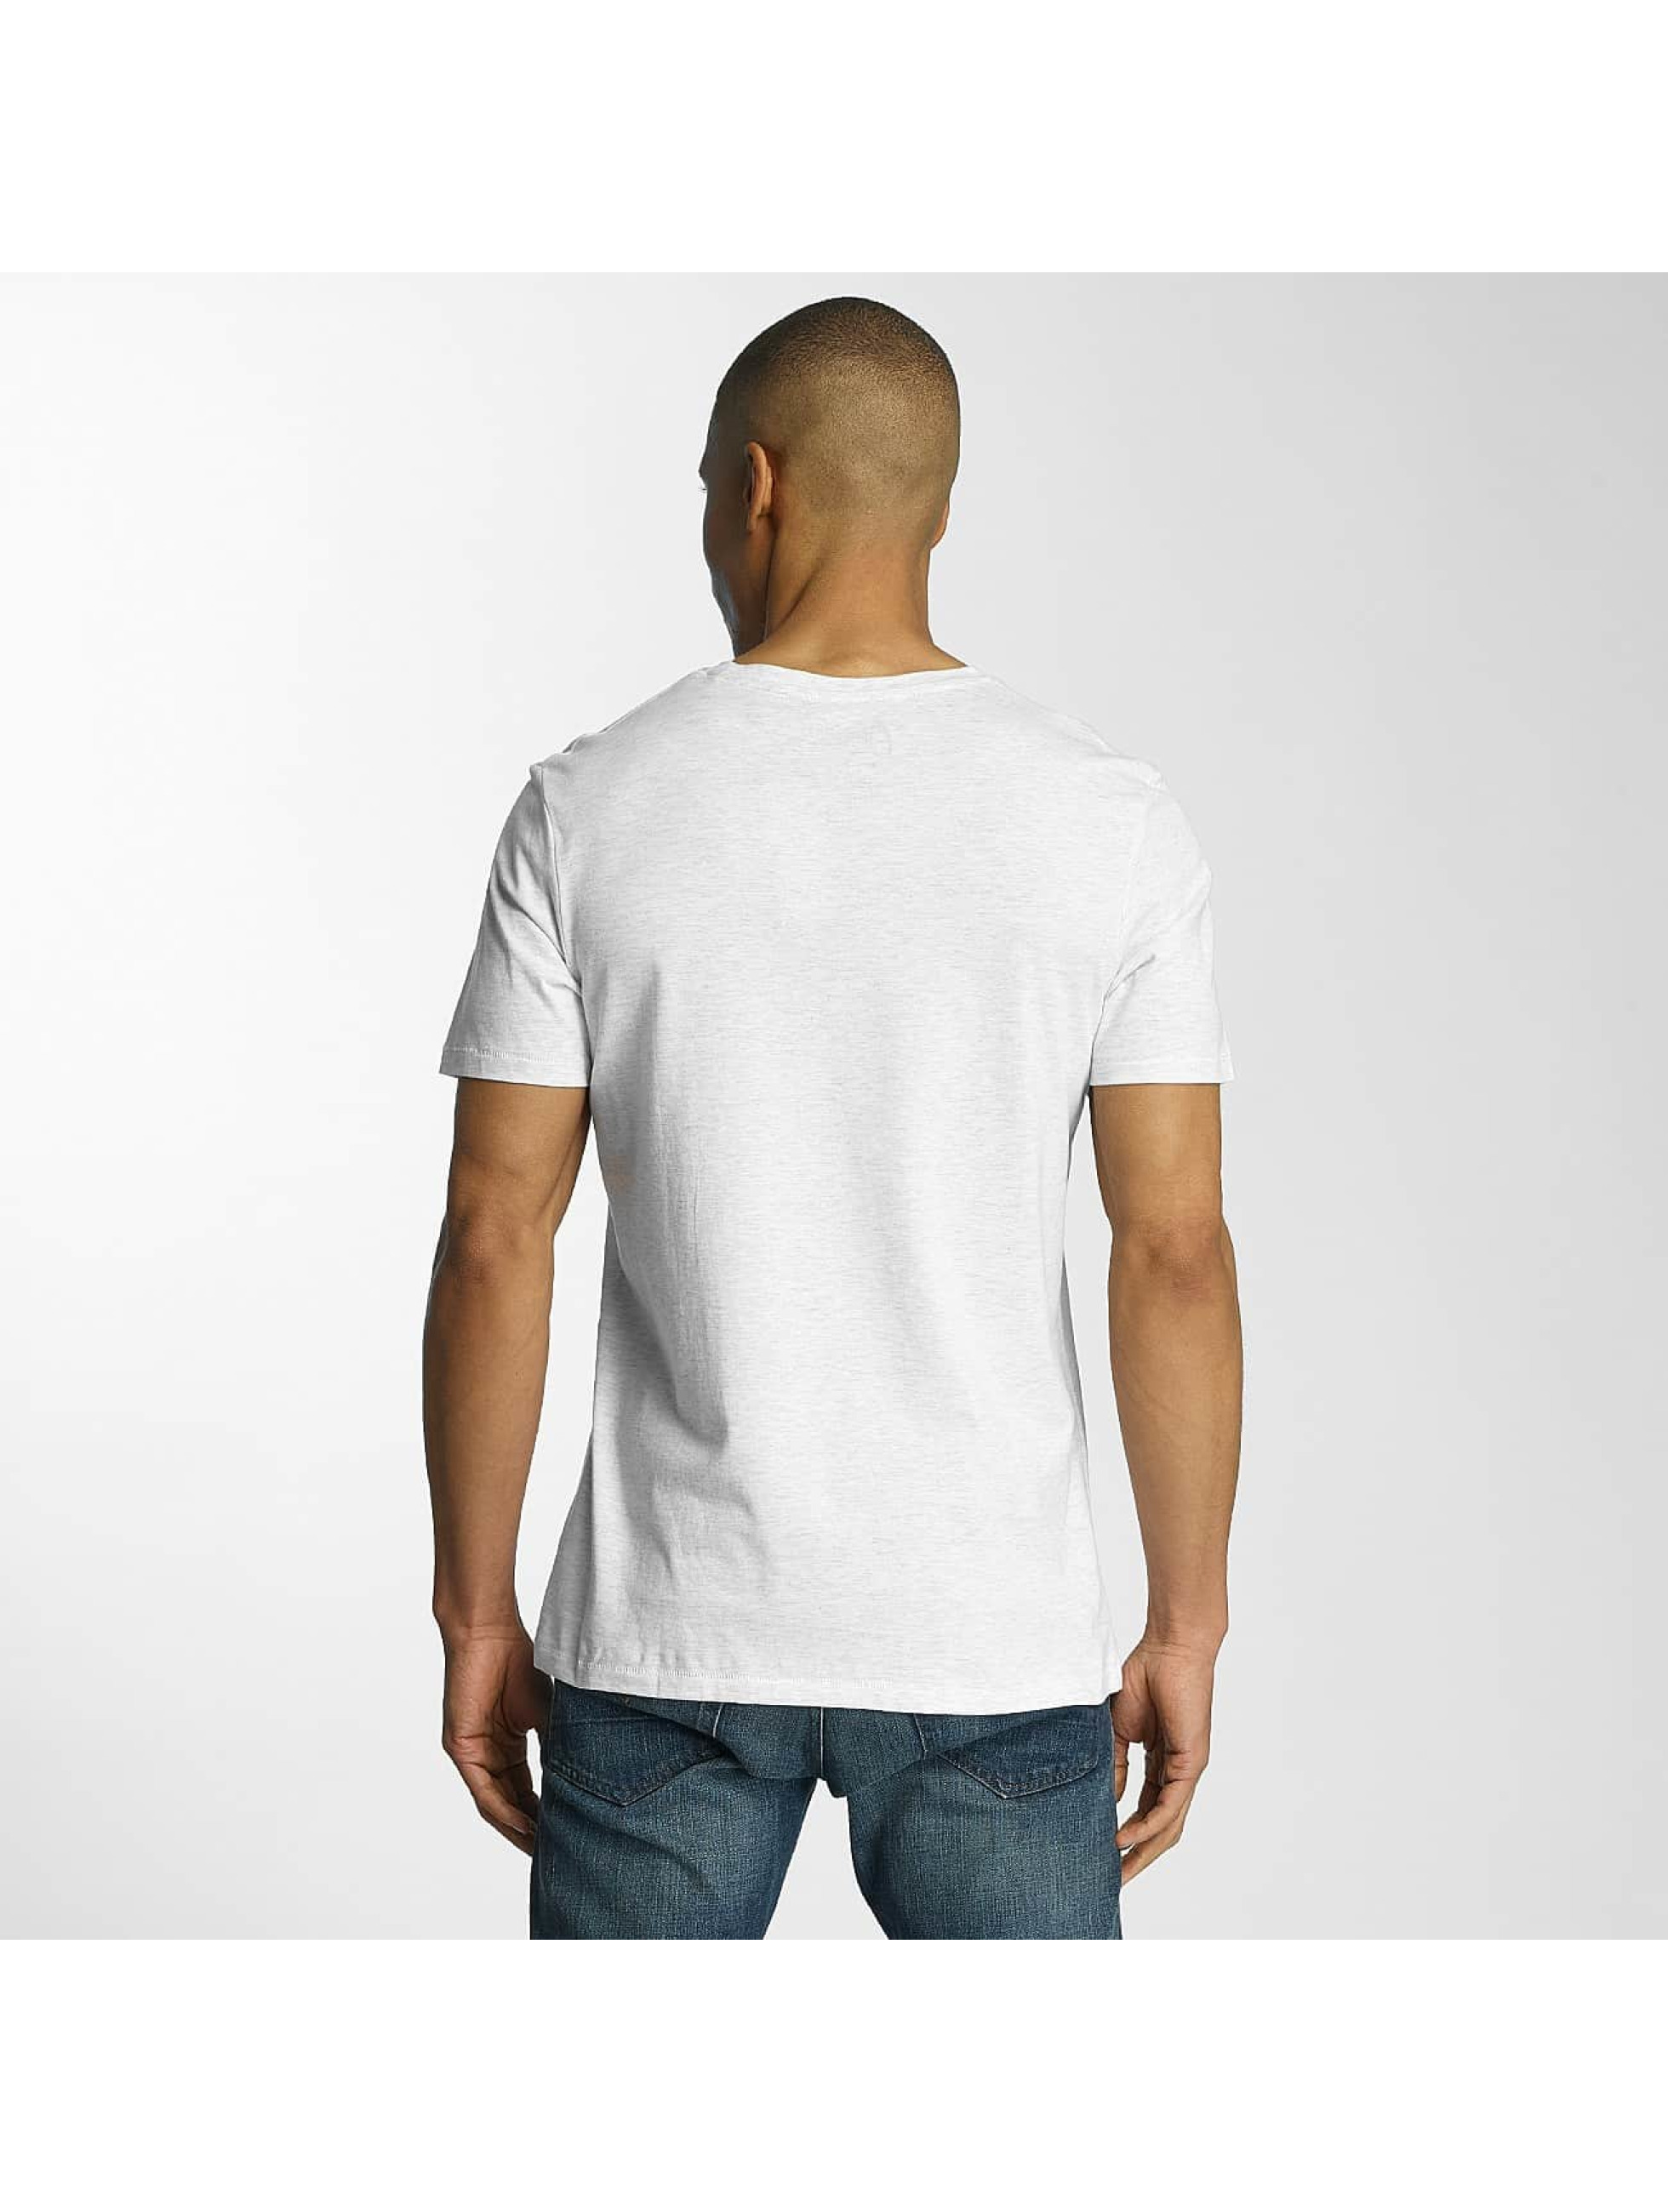 Jack-amp-Jones-Uomini-Maglieria-T-shirt-jorCreek